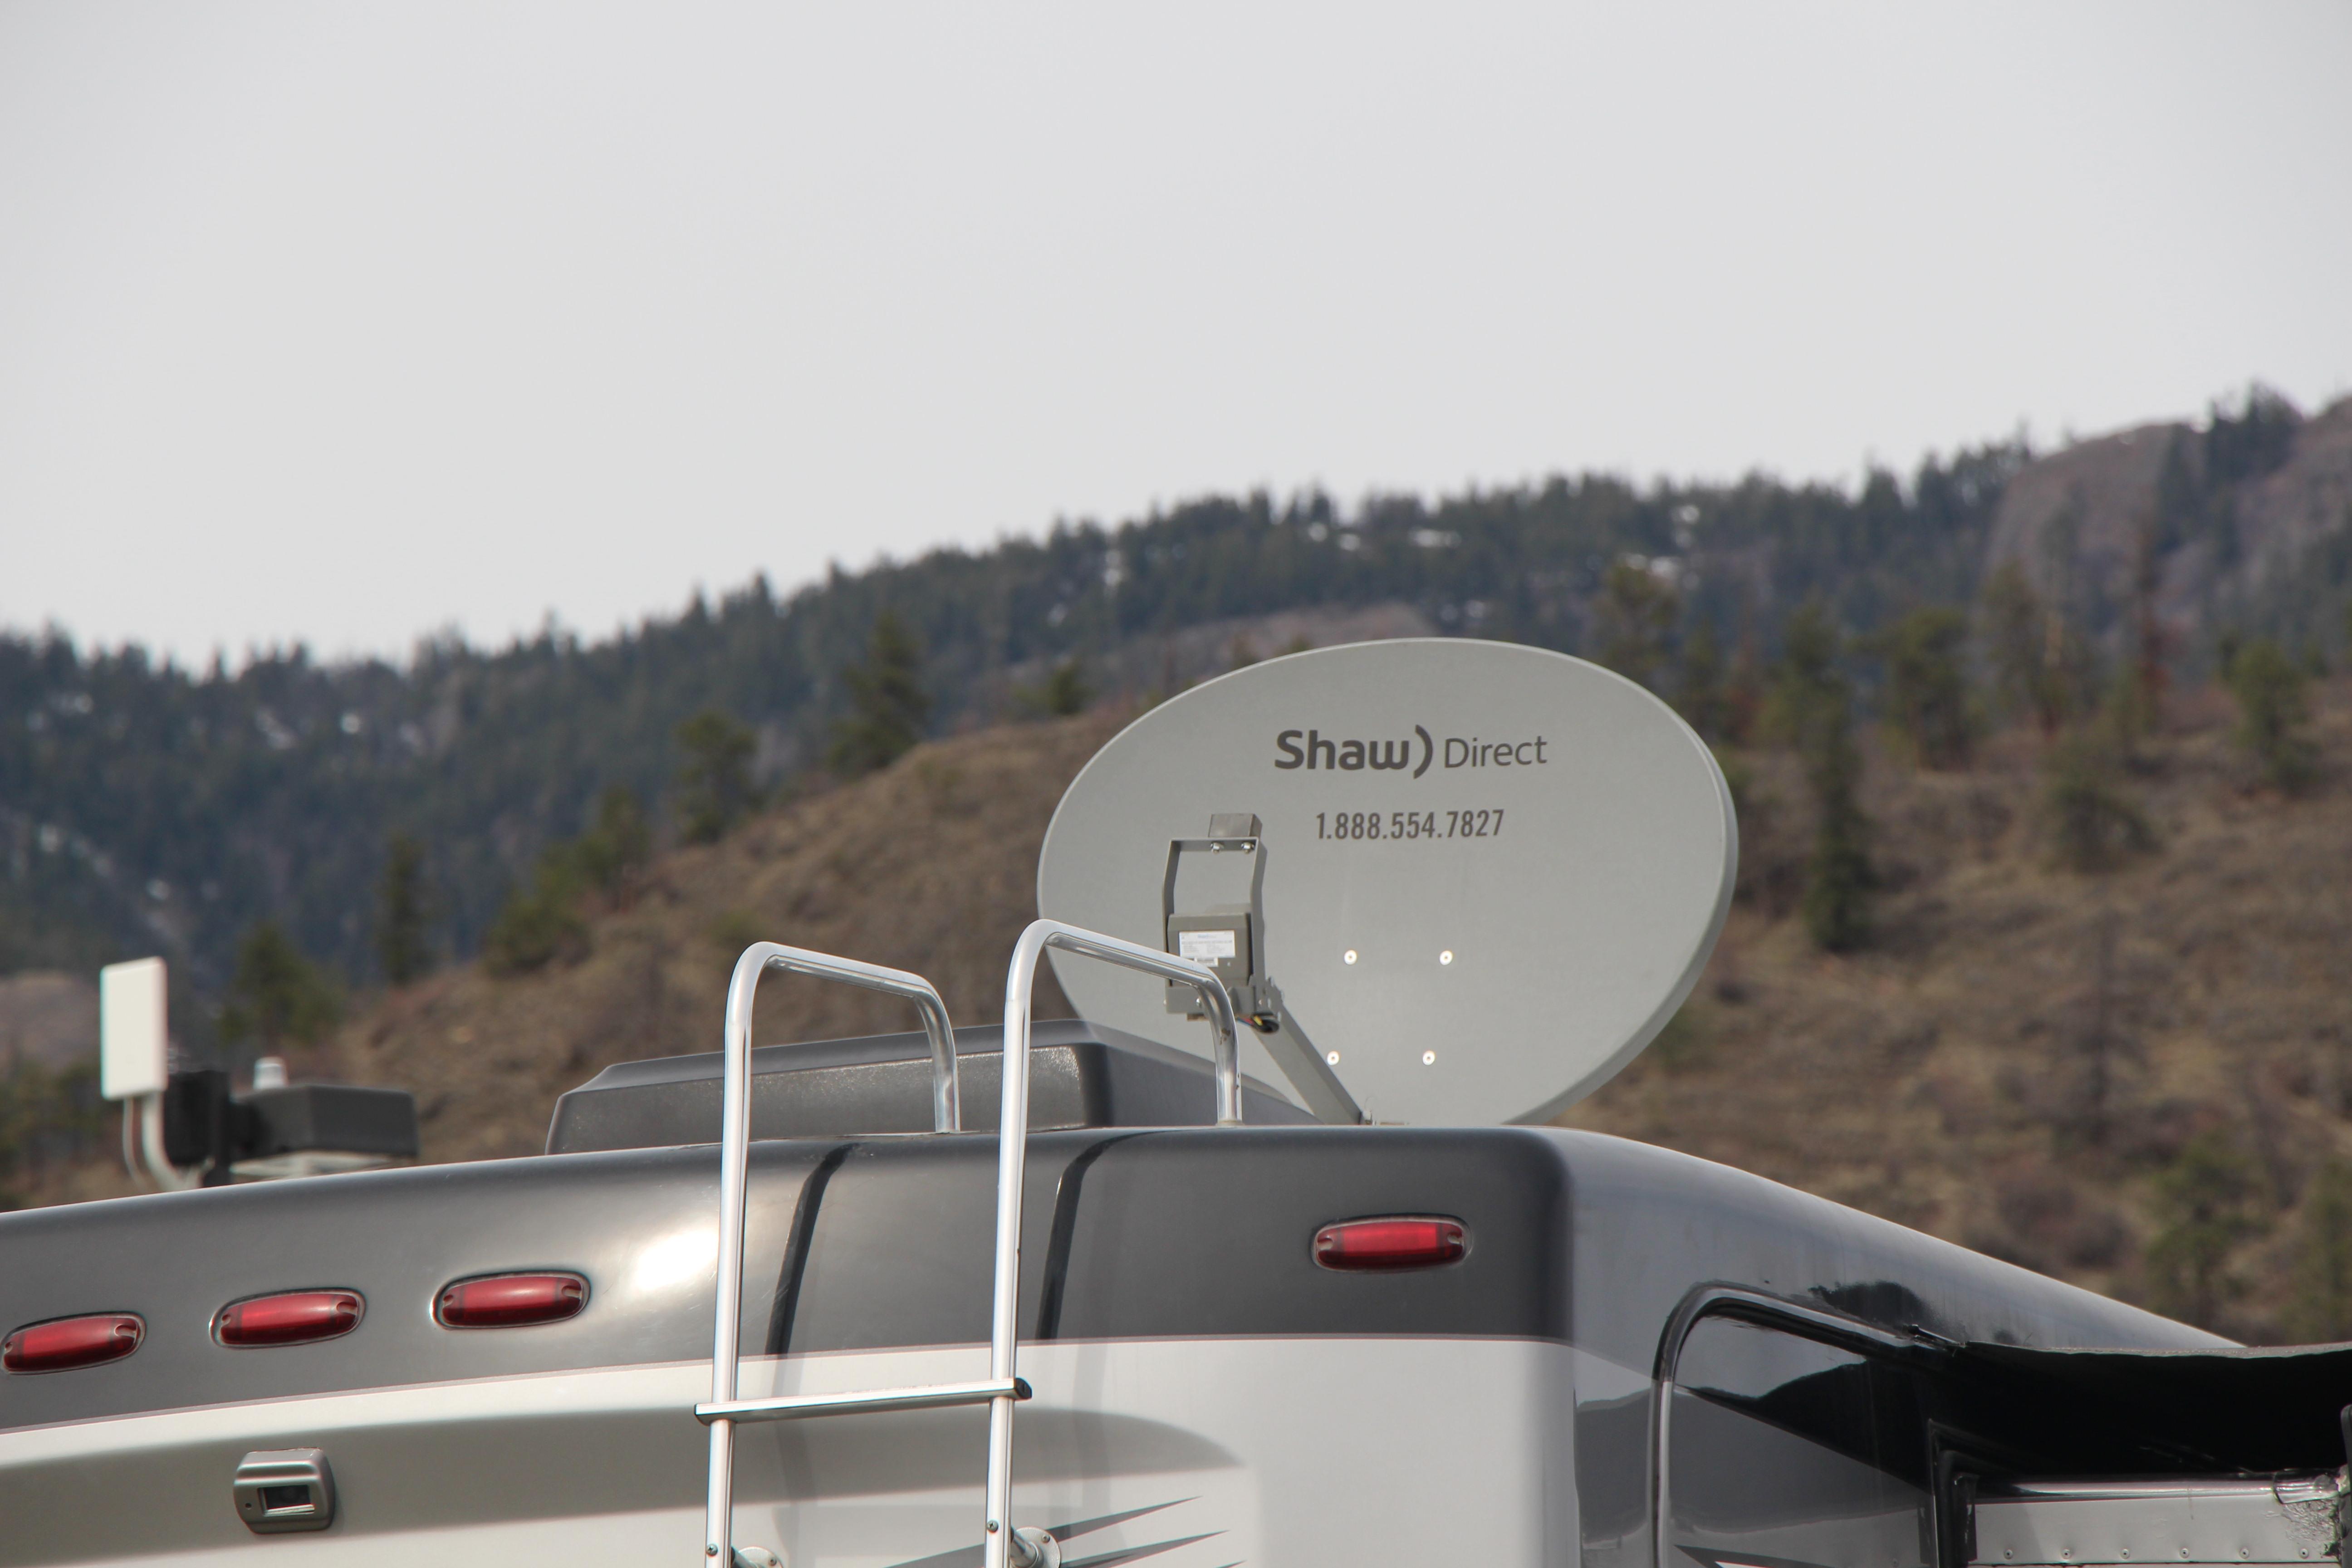 An RV satellite dish.